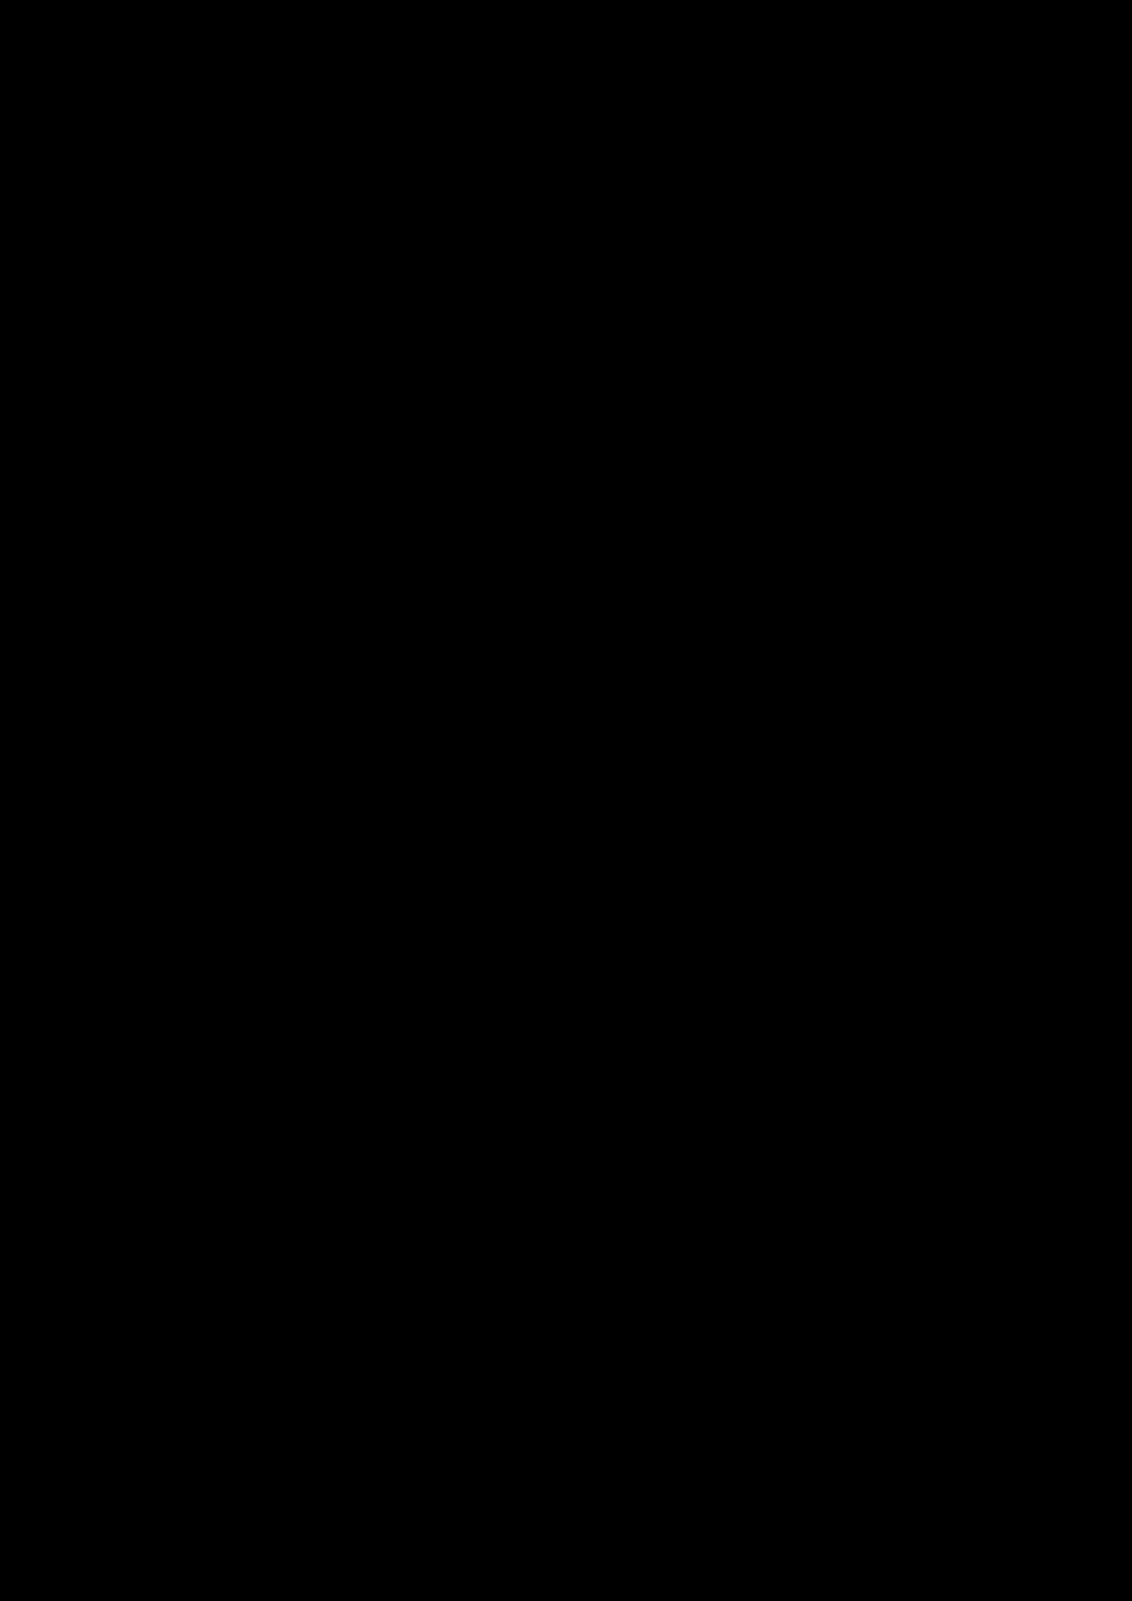 Belyiy sokol slide, Image 43